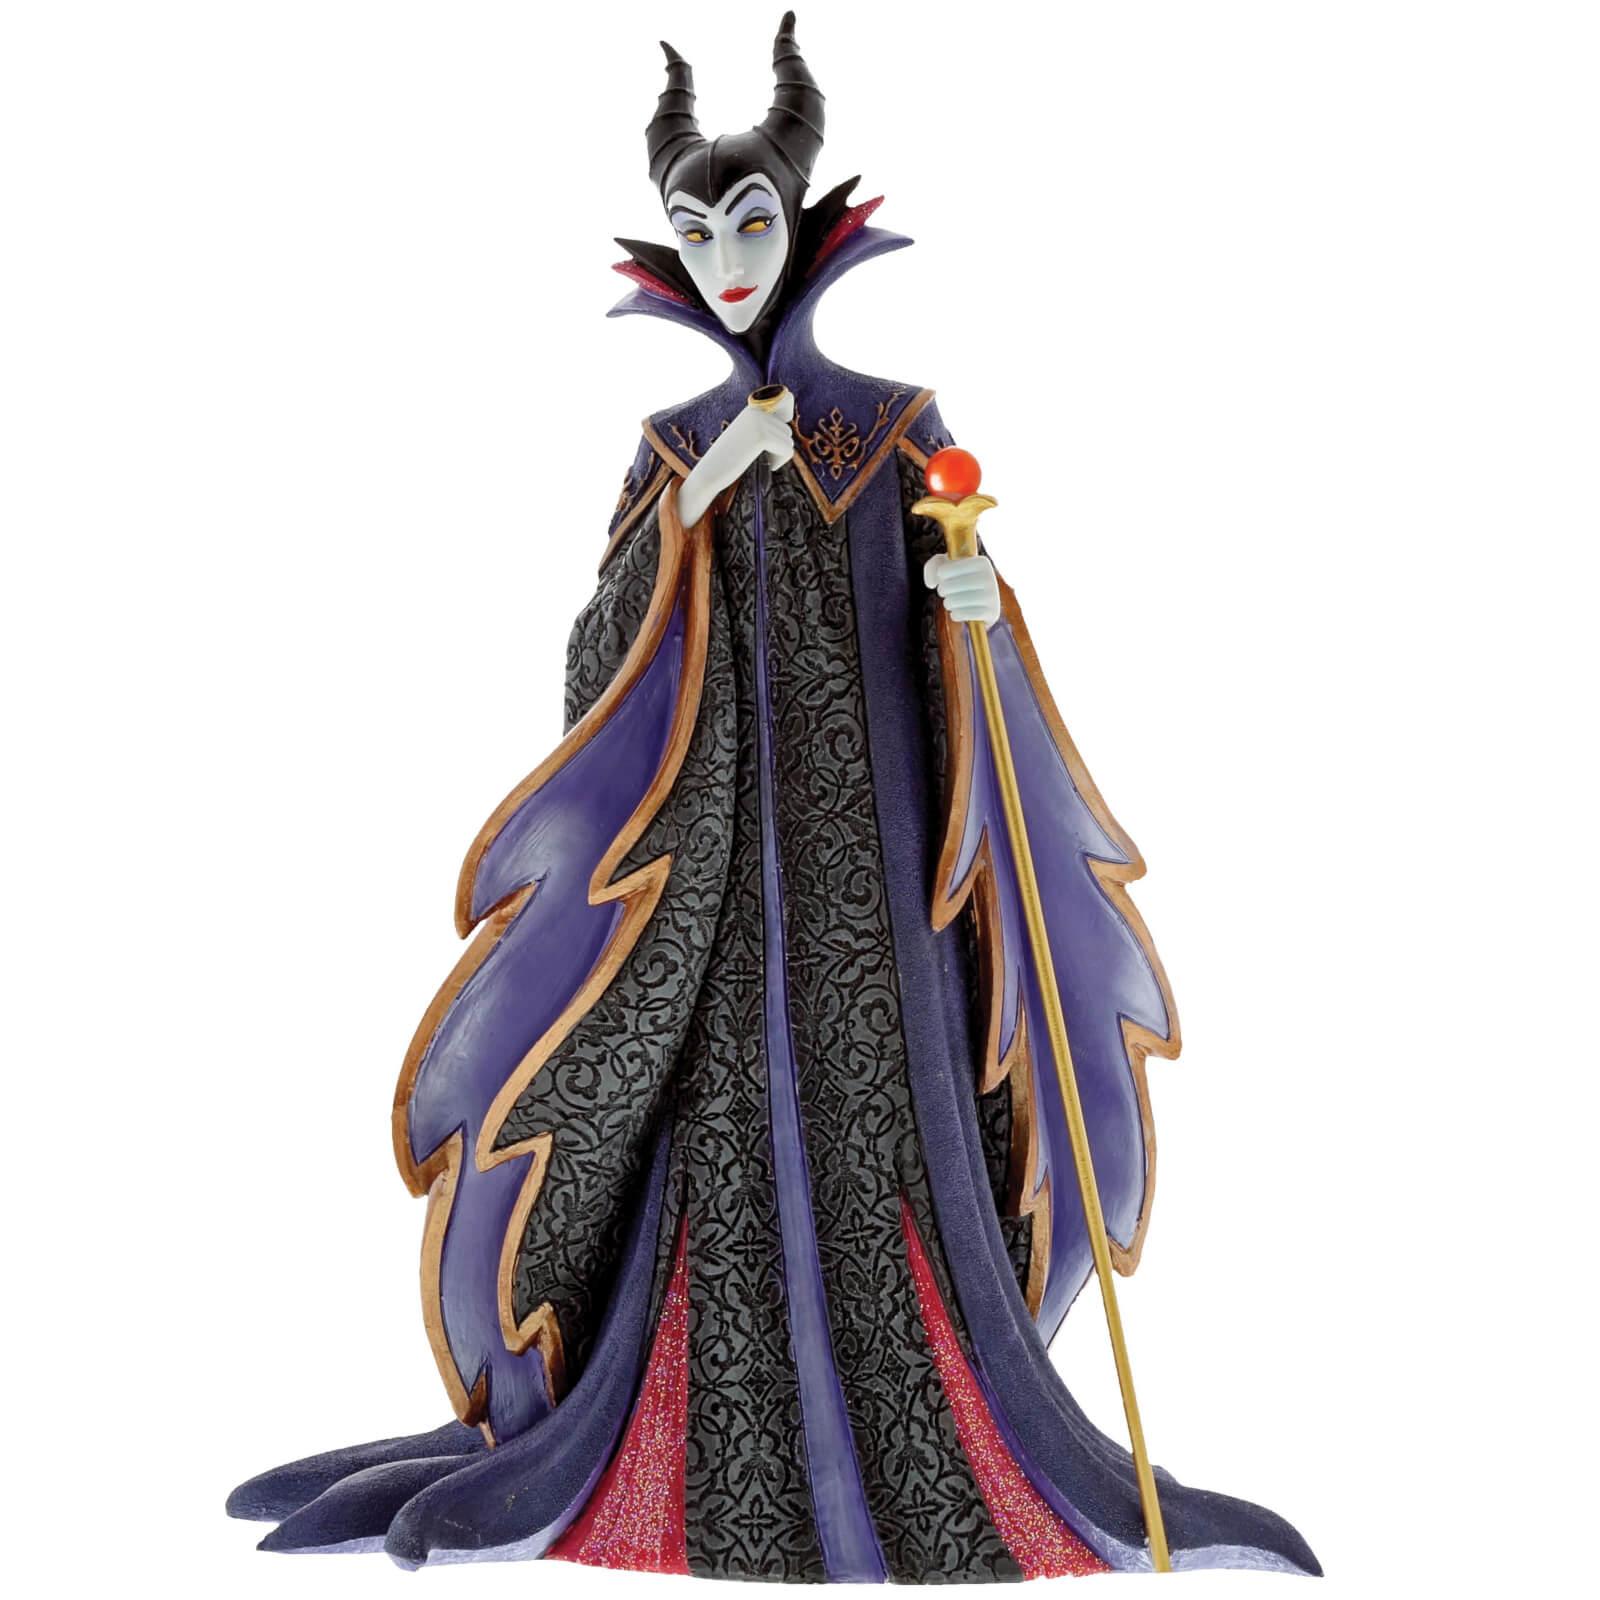 Image of Disney Showcase Maleficent Figurine